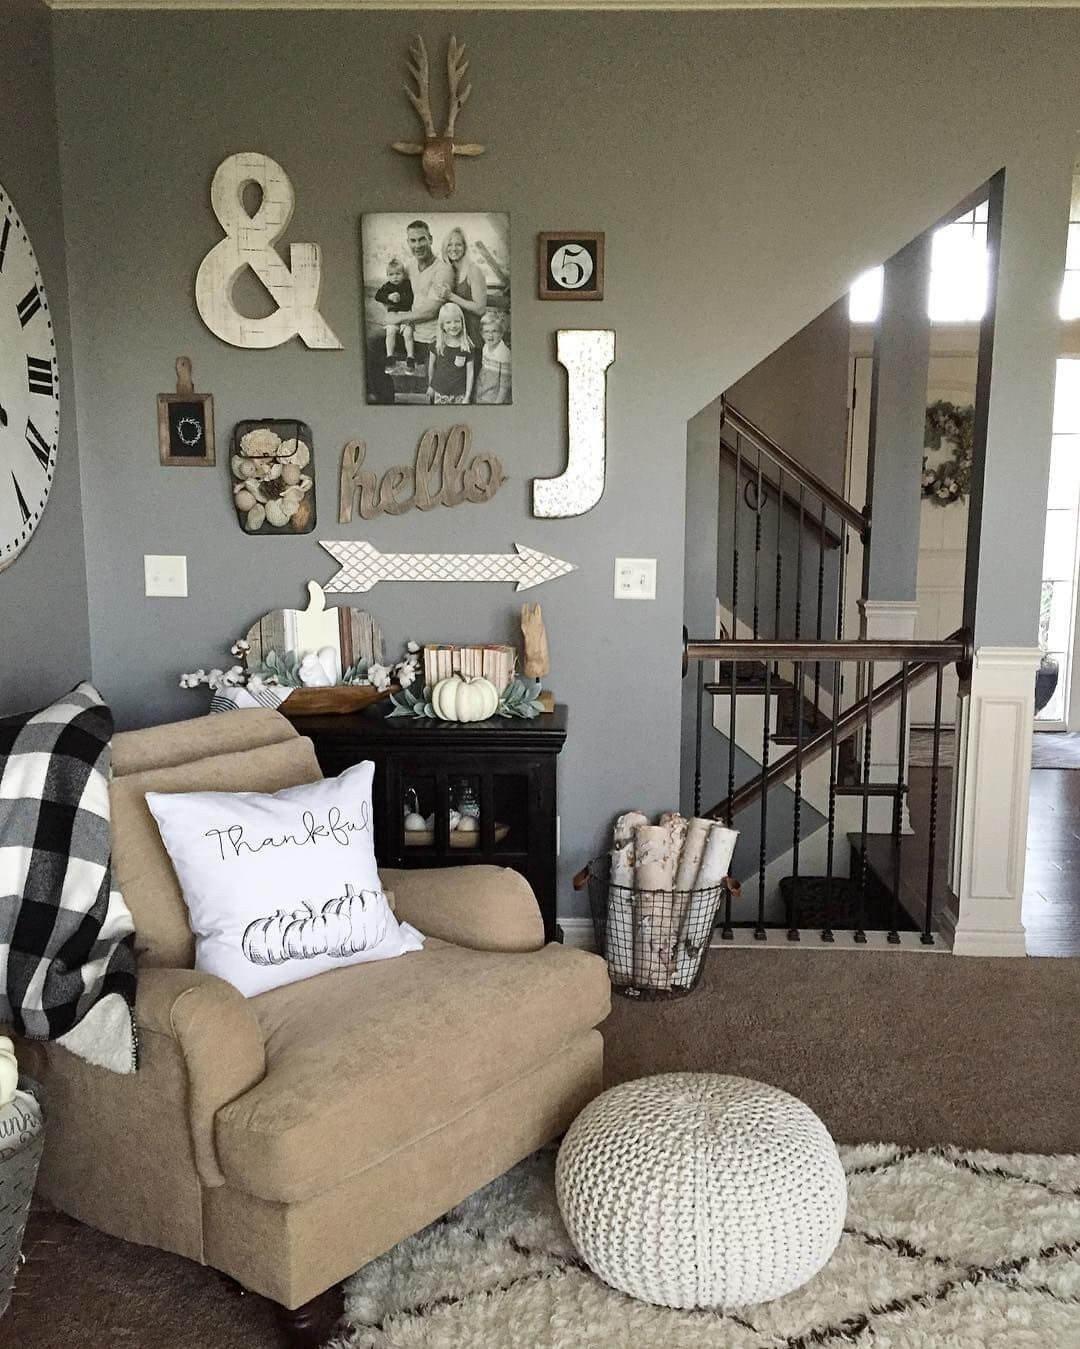 Living Room Wall Decor Ideas Beautiful 33 Best Rustic Living Room Wall Decor Ideas and Designs